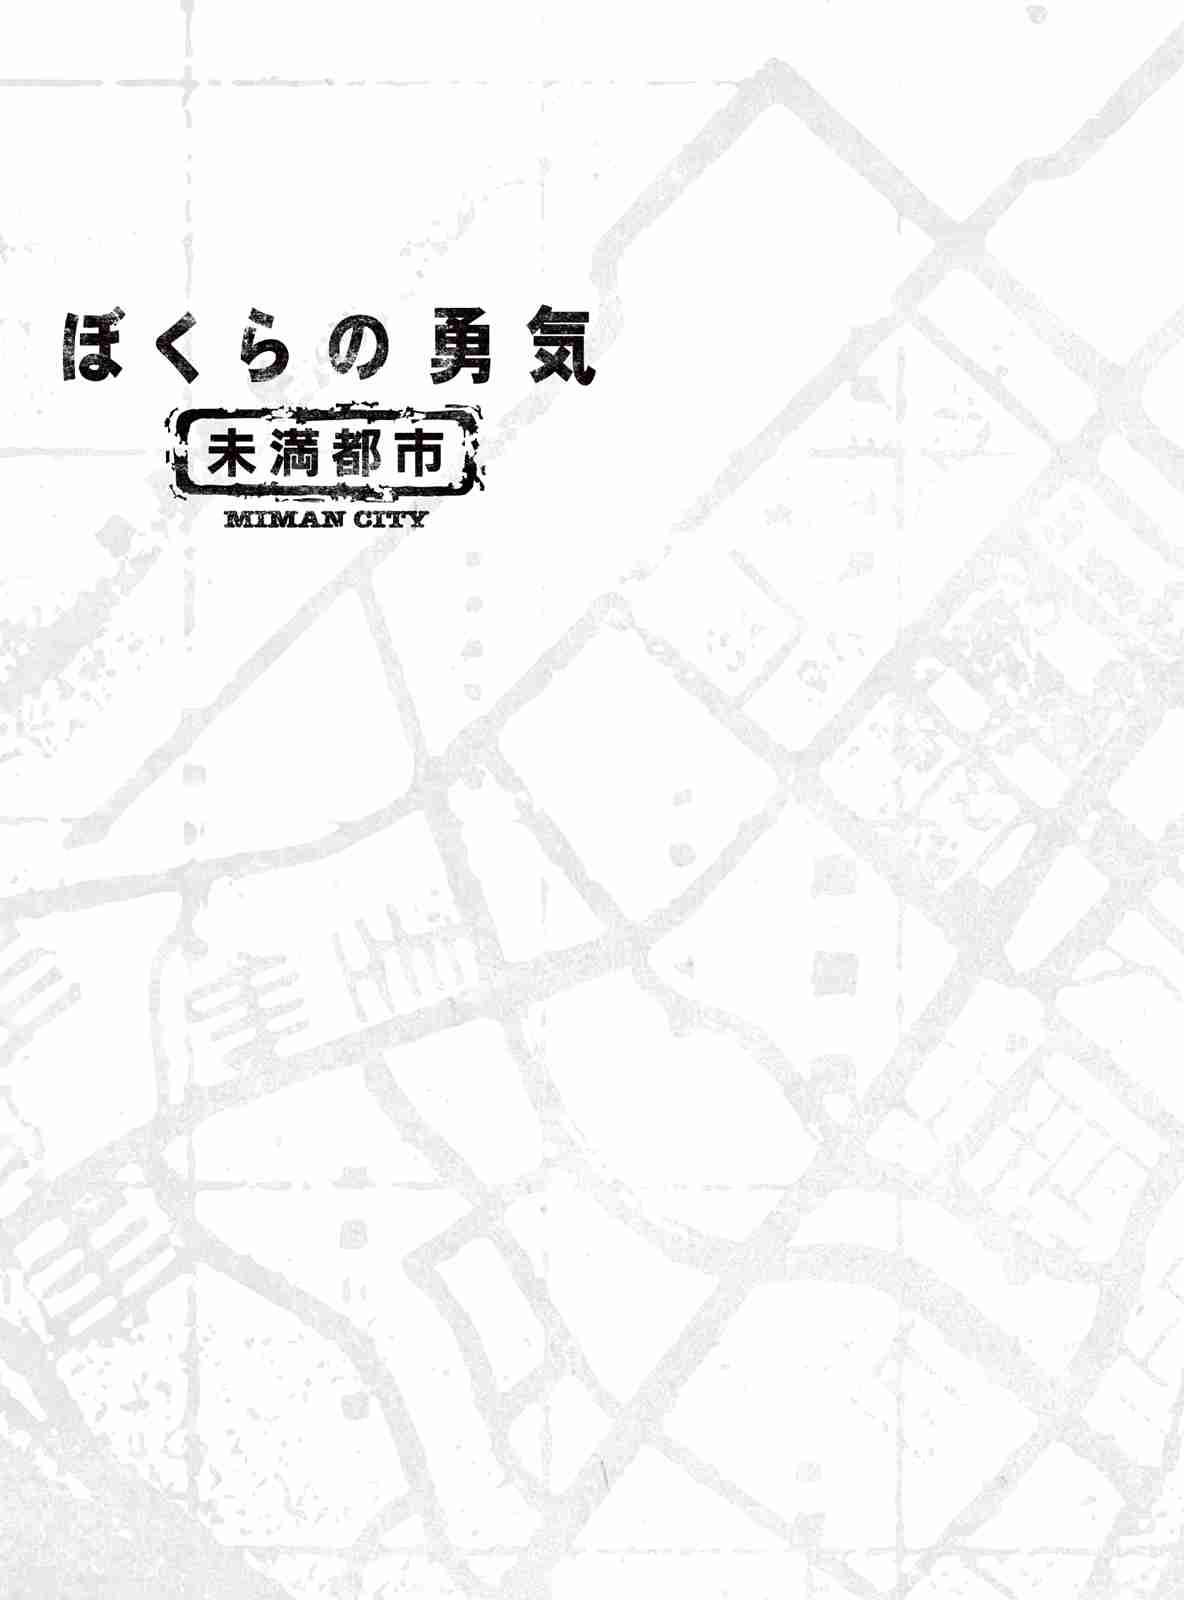 KinKi Kidsドラマ「ぼくらの勇気」初DVD化!放送20年で 7月に新作放送 - シネマトゥデイ